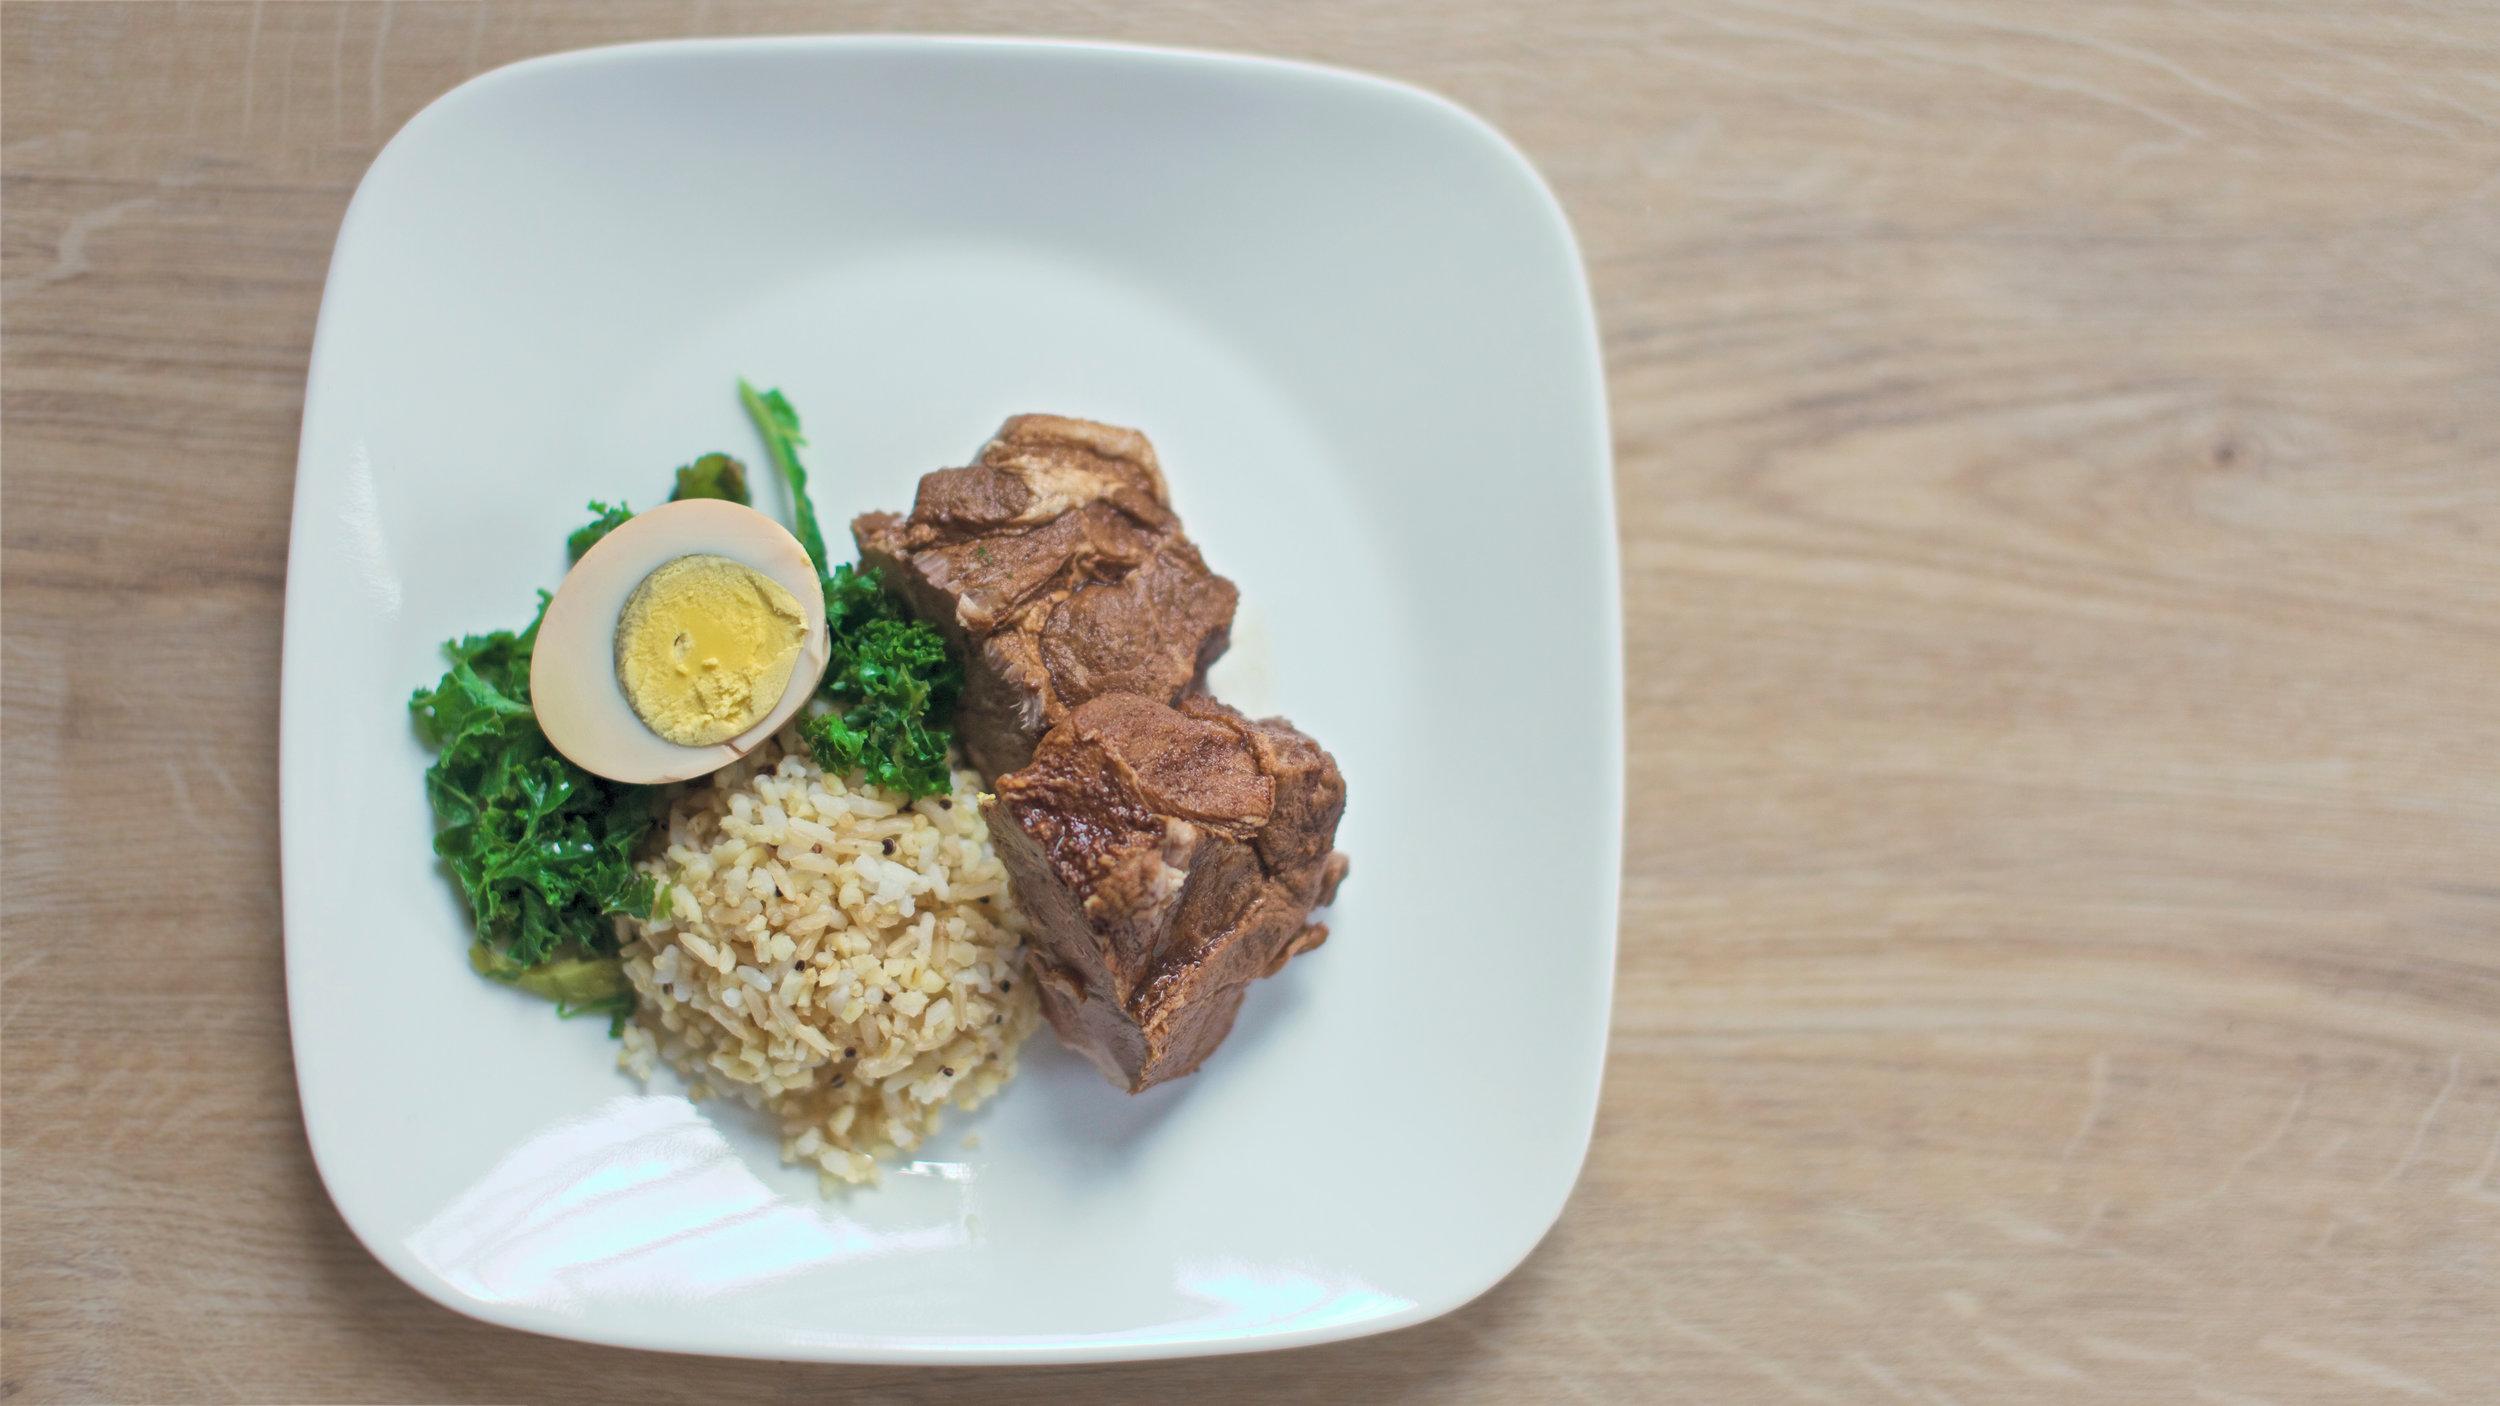 Five Spice Braised Pork Recipe (Loh Bak 滷肉)